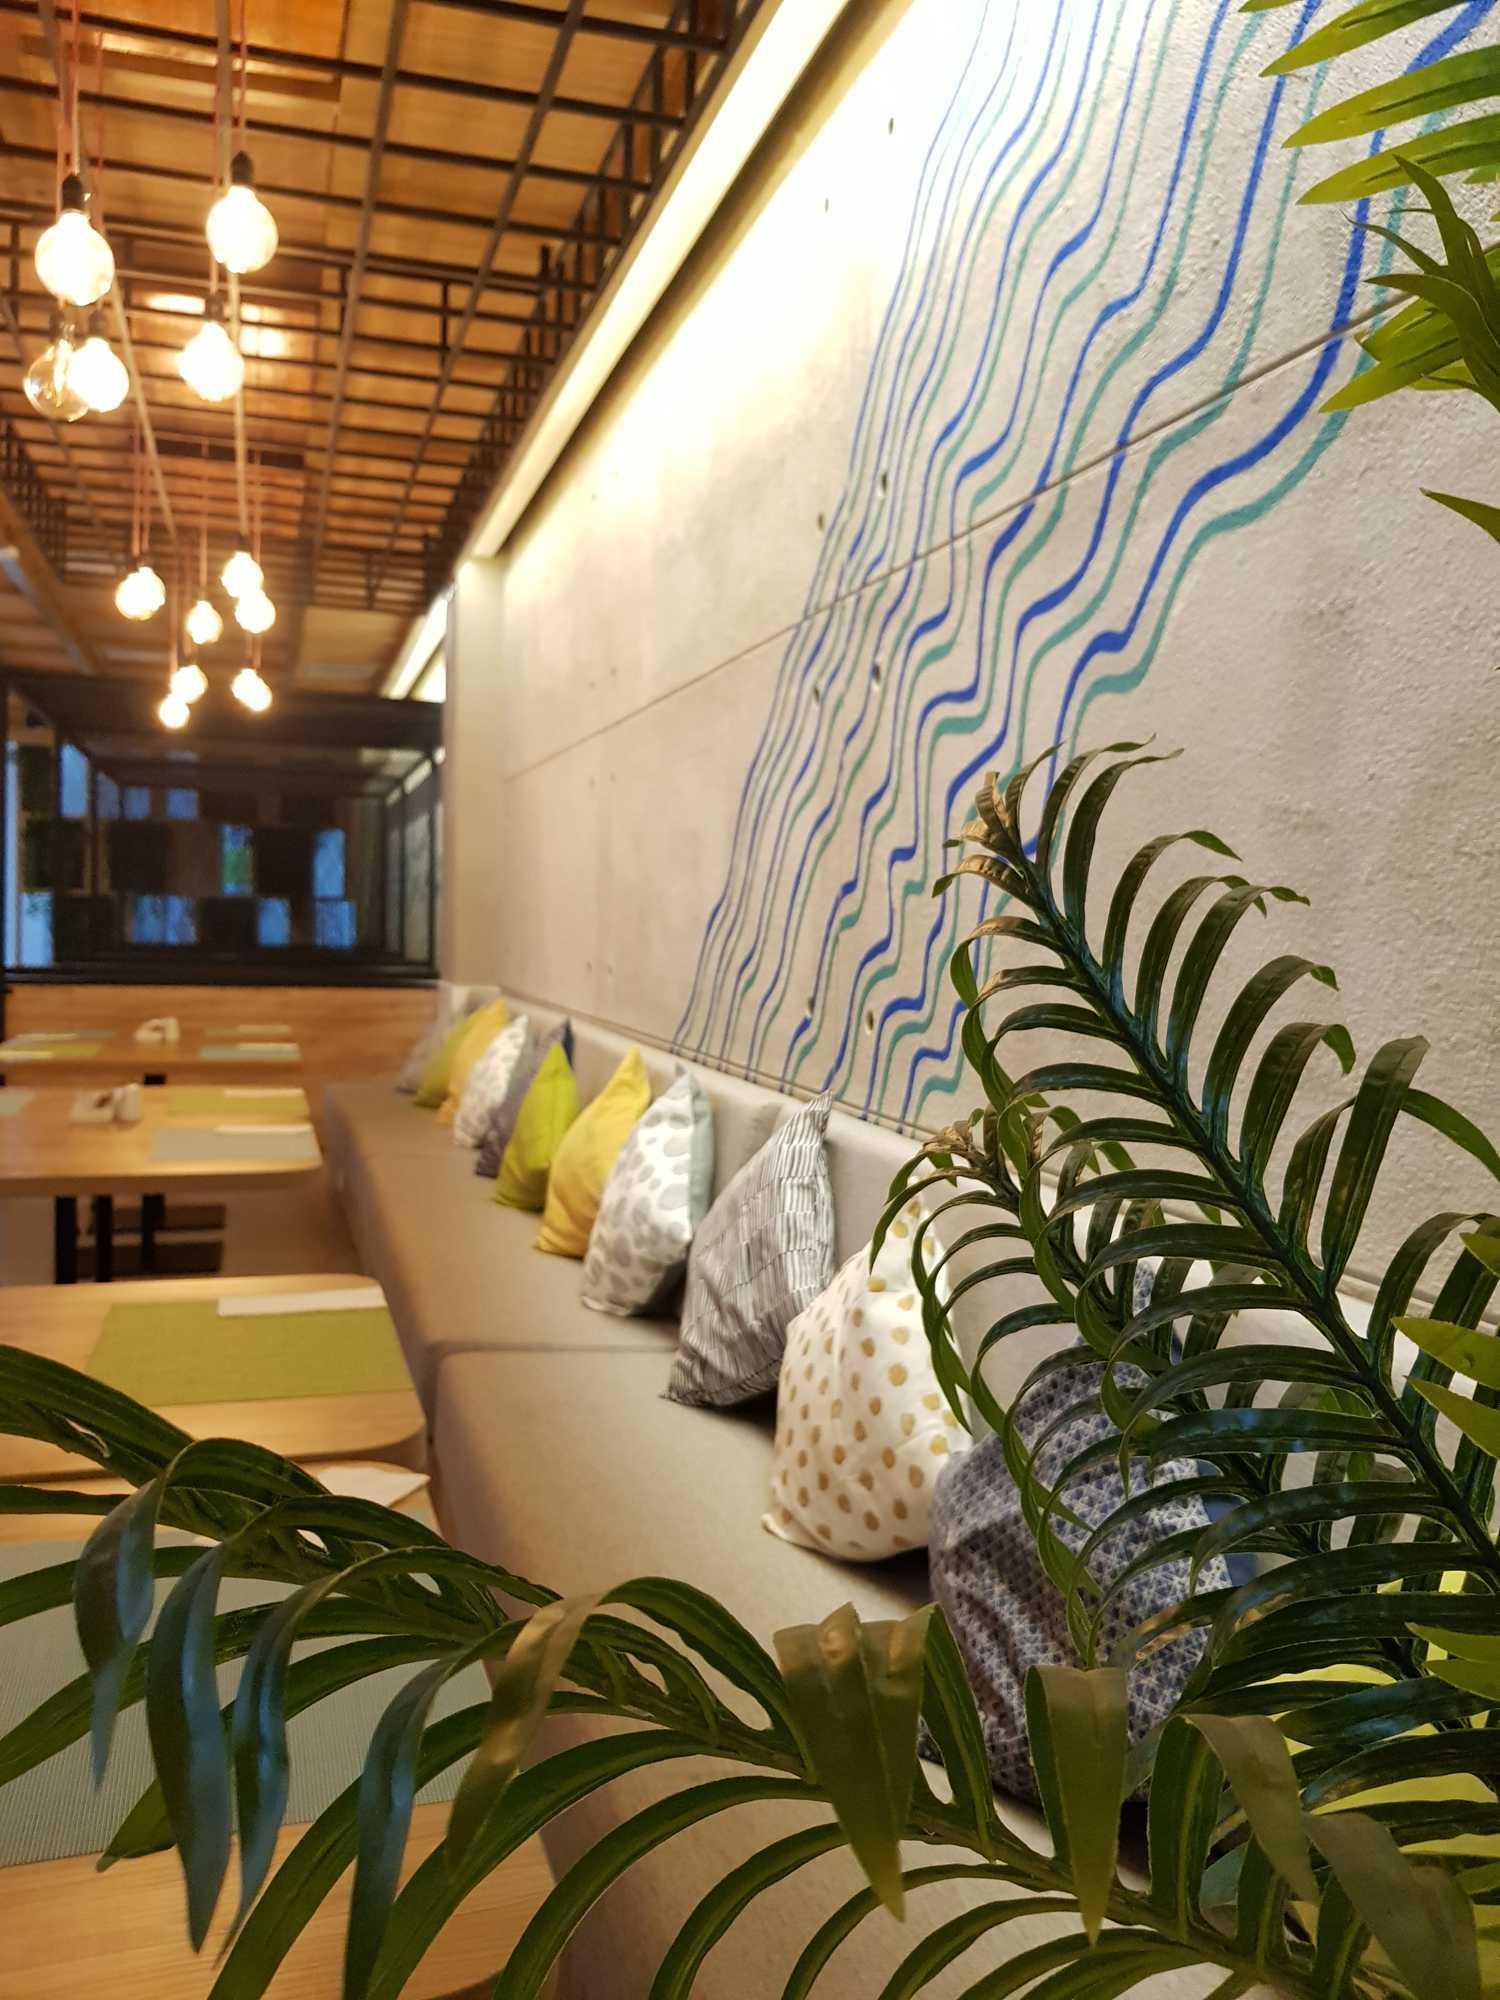 Ruang Komunal Kemiri Restaurant Surabaya, Kota Sby, Jawa Timur, Indonesia Surabaya, Kota Sby, Jawa Timur, Indonesia Ruang-Komunal-Kemiri-House   61180